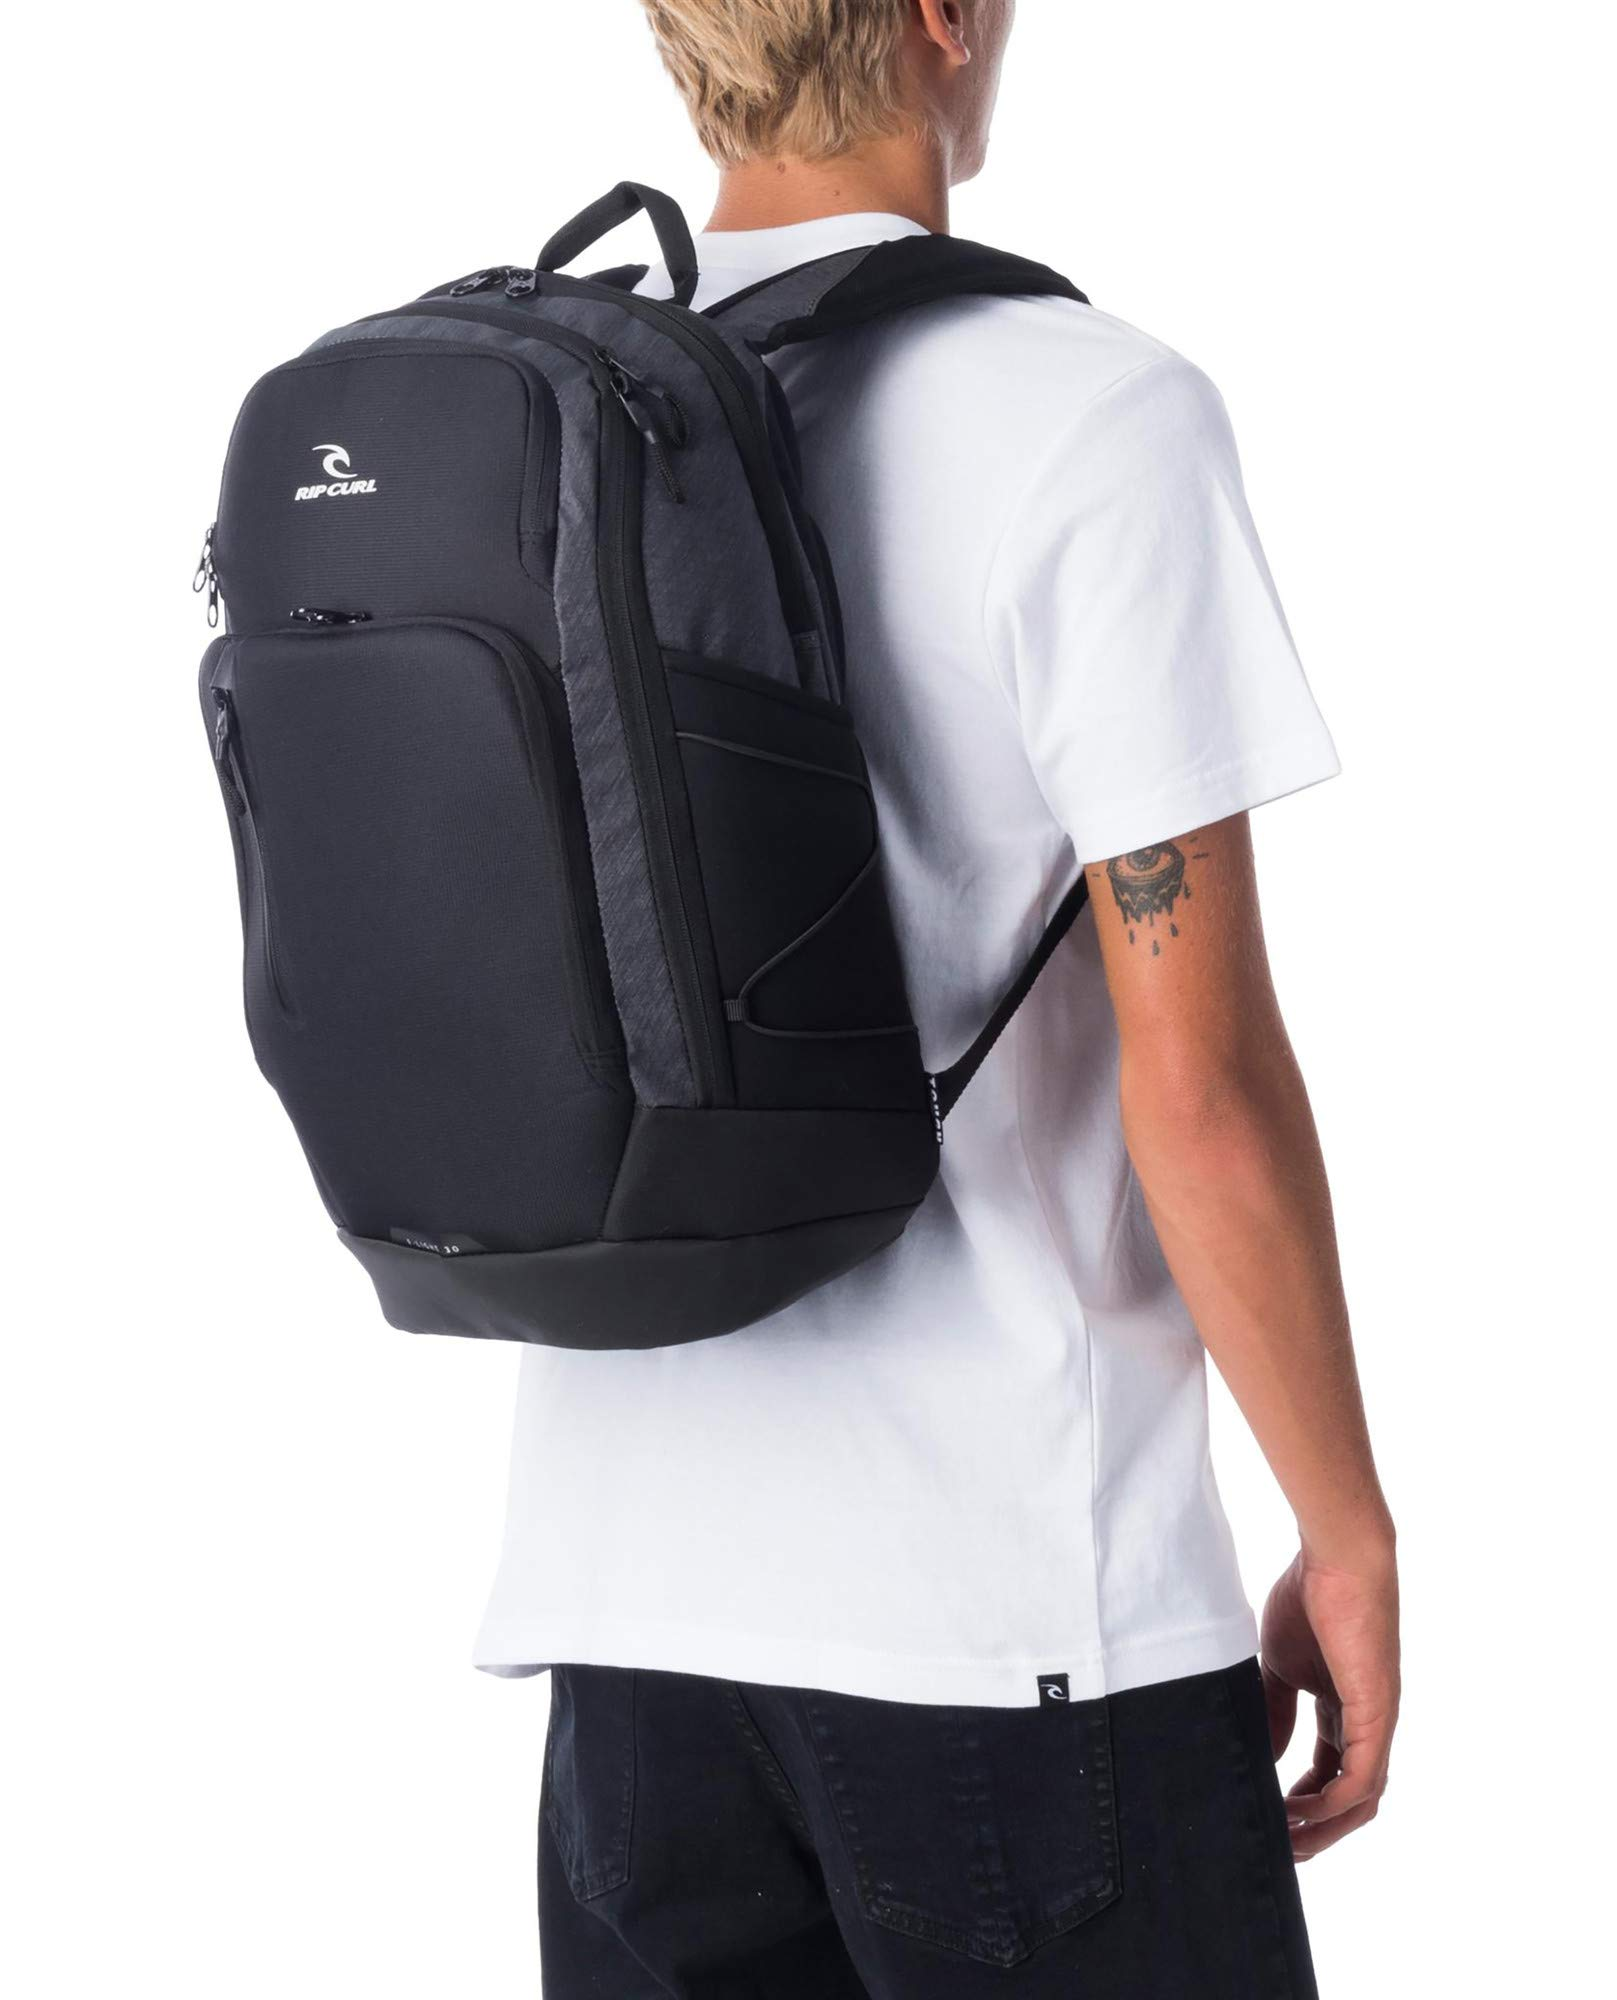 RIP CURL Backpack Mochila de Viaje,Ultraligera,Compartimento Acolchado para port/átil